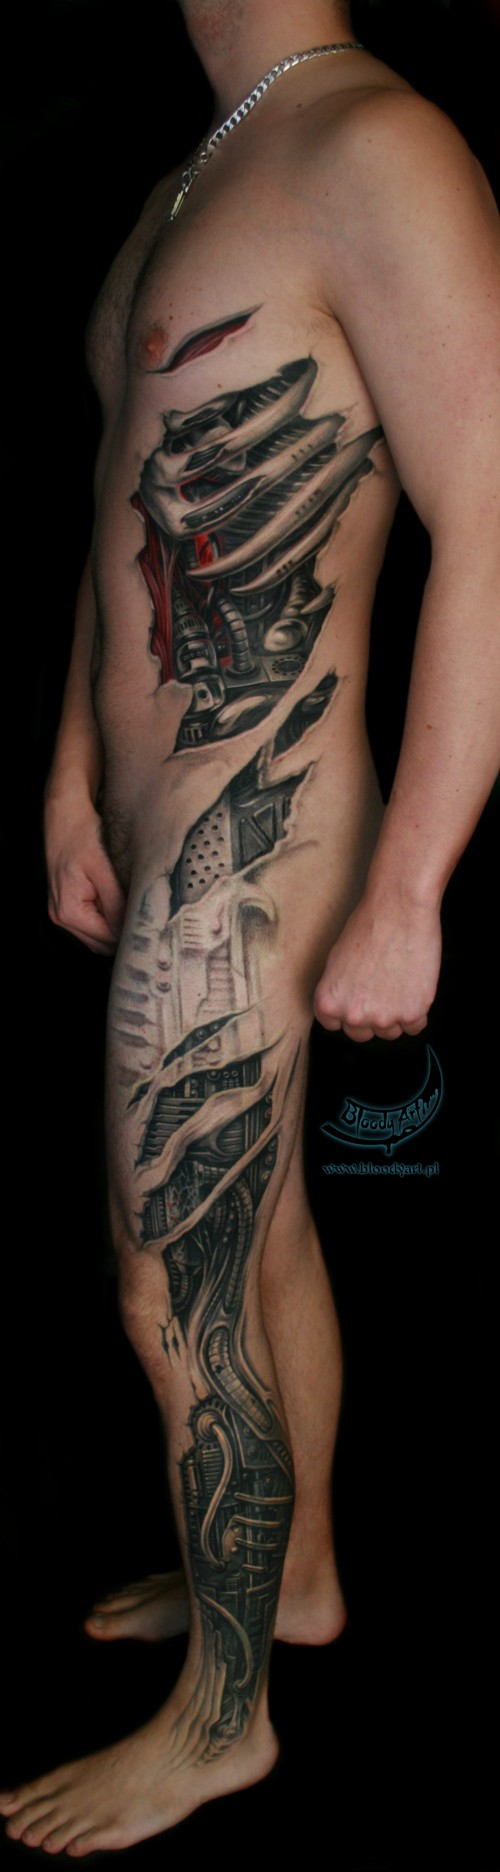 Bionic Bioimplantate 3d Gesucht Tattoo Studios Tattooscout